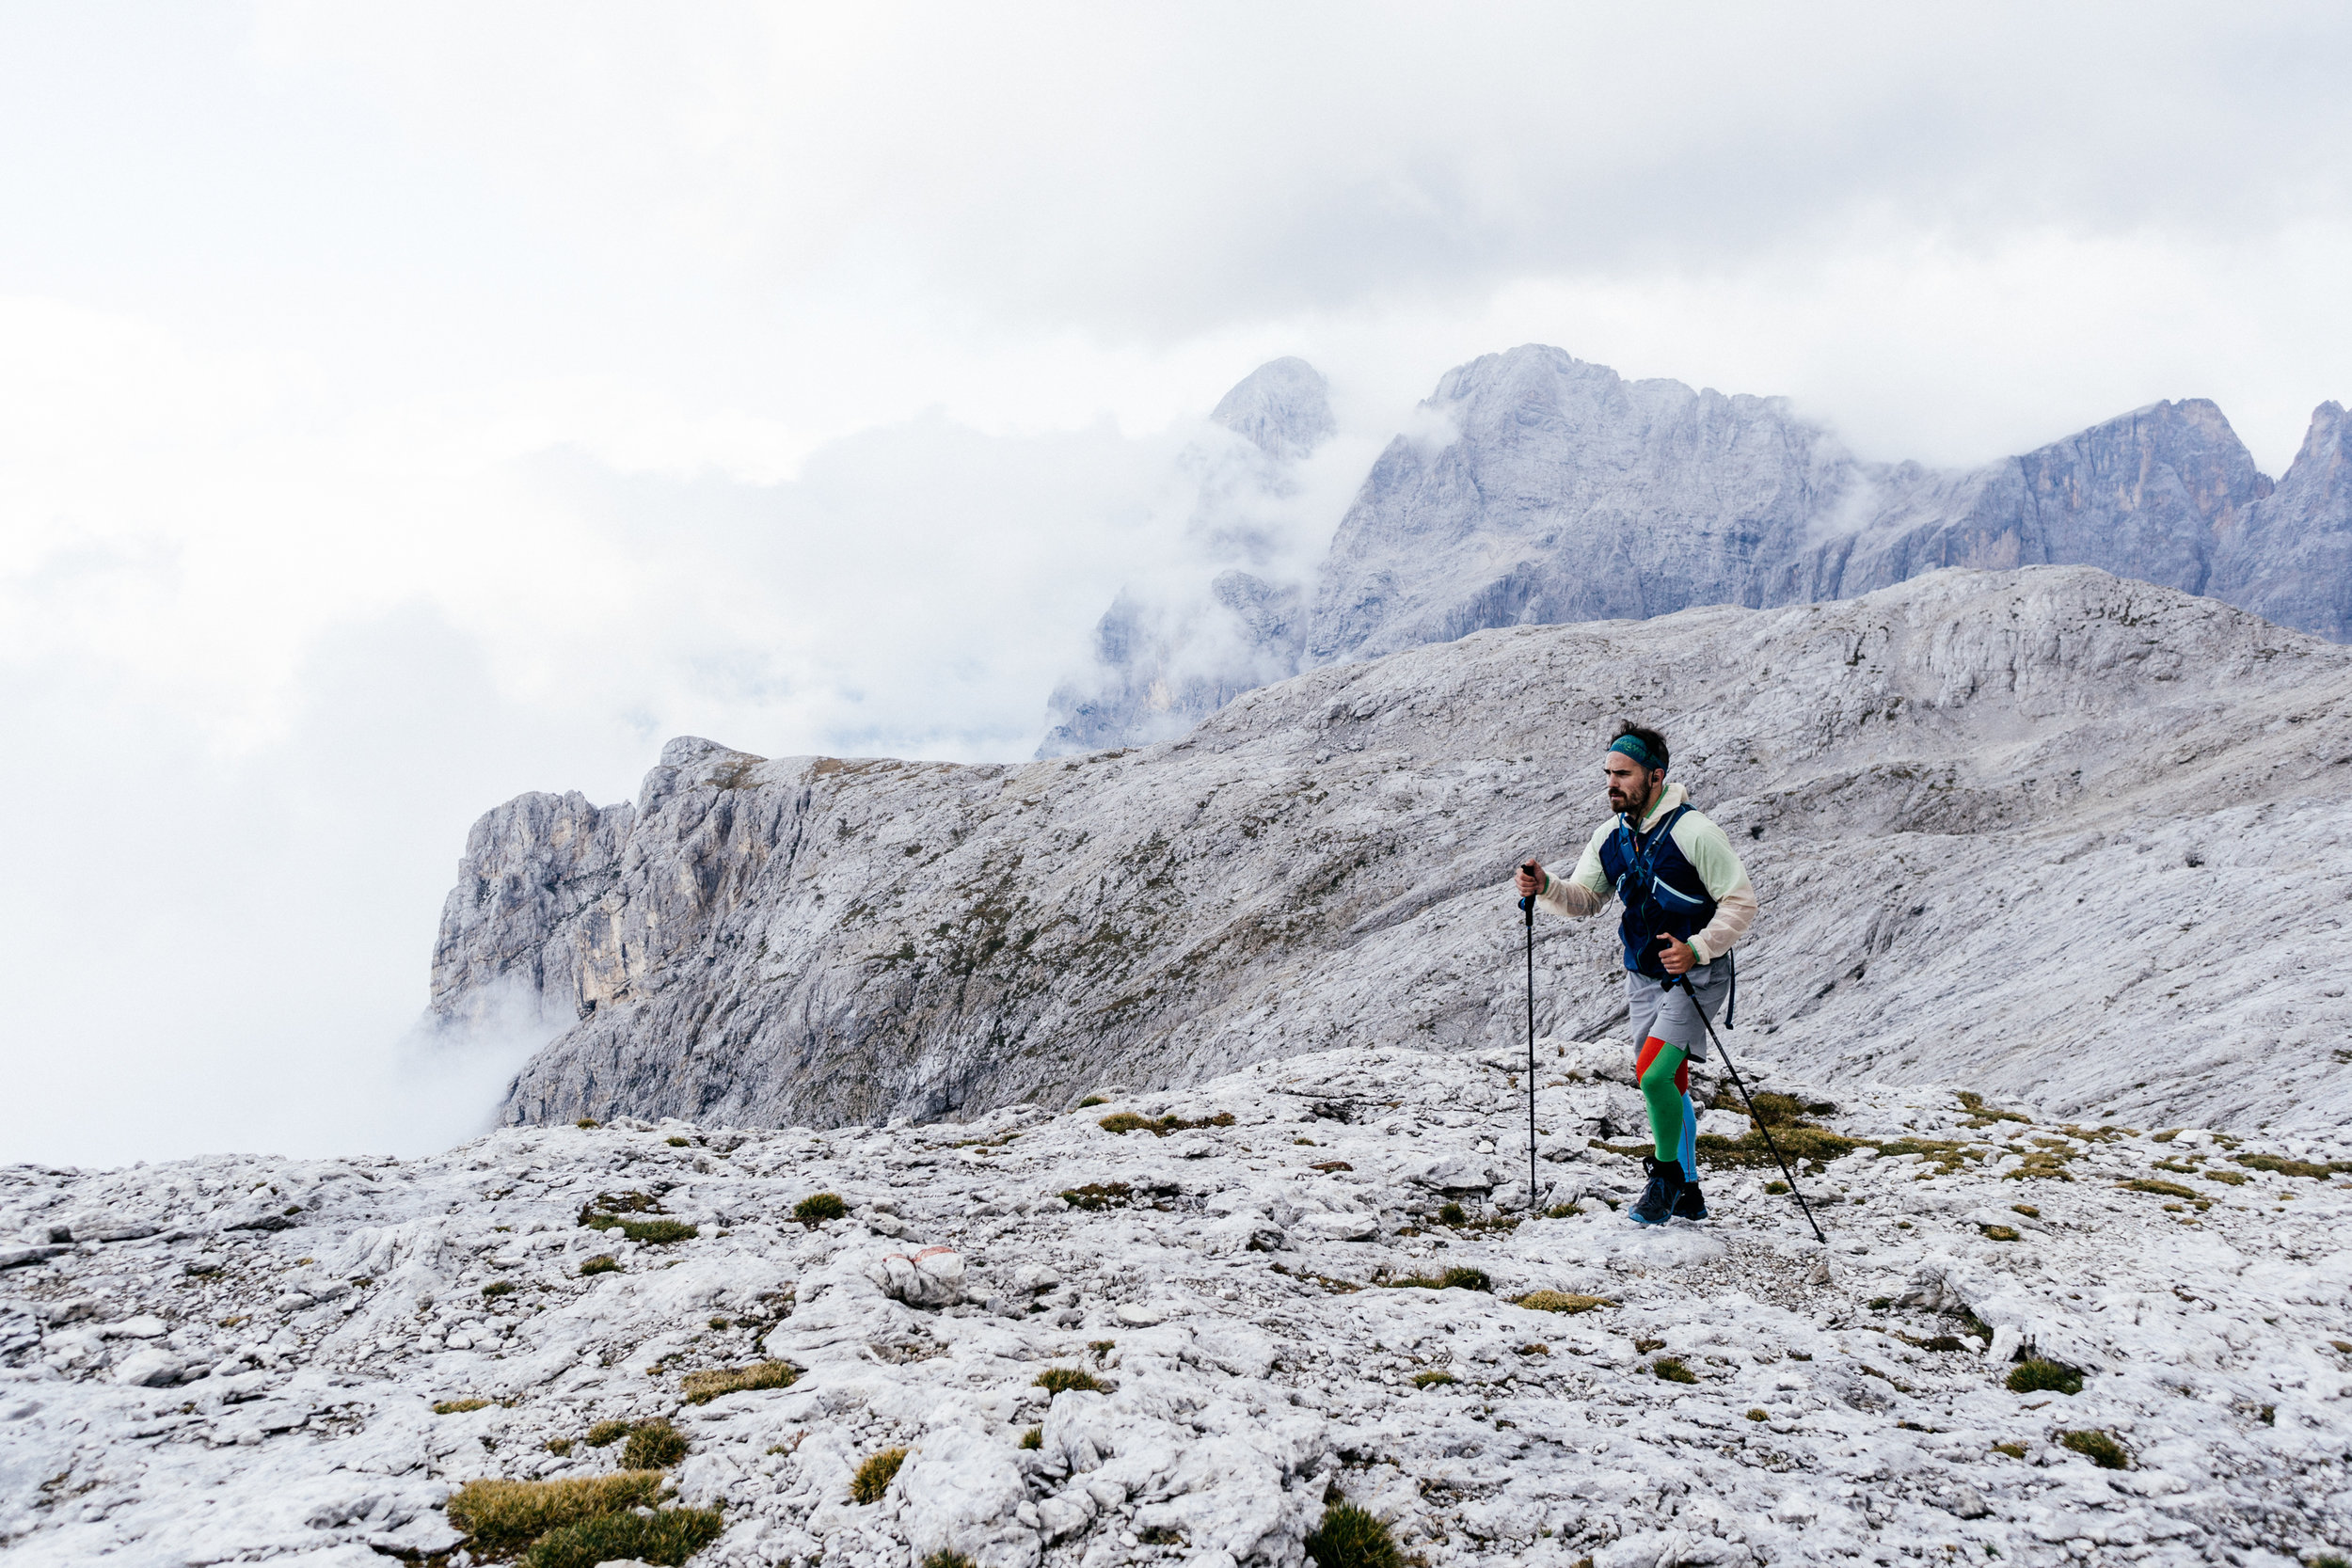 Dolomites-ChrisBrinleeJr-SEP17-56.jpg